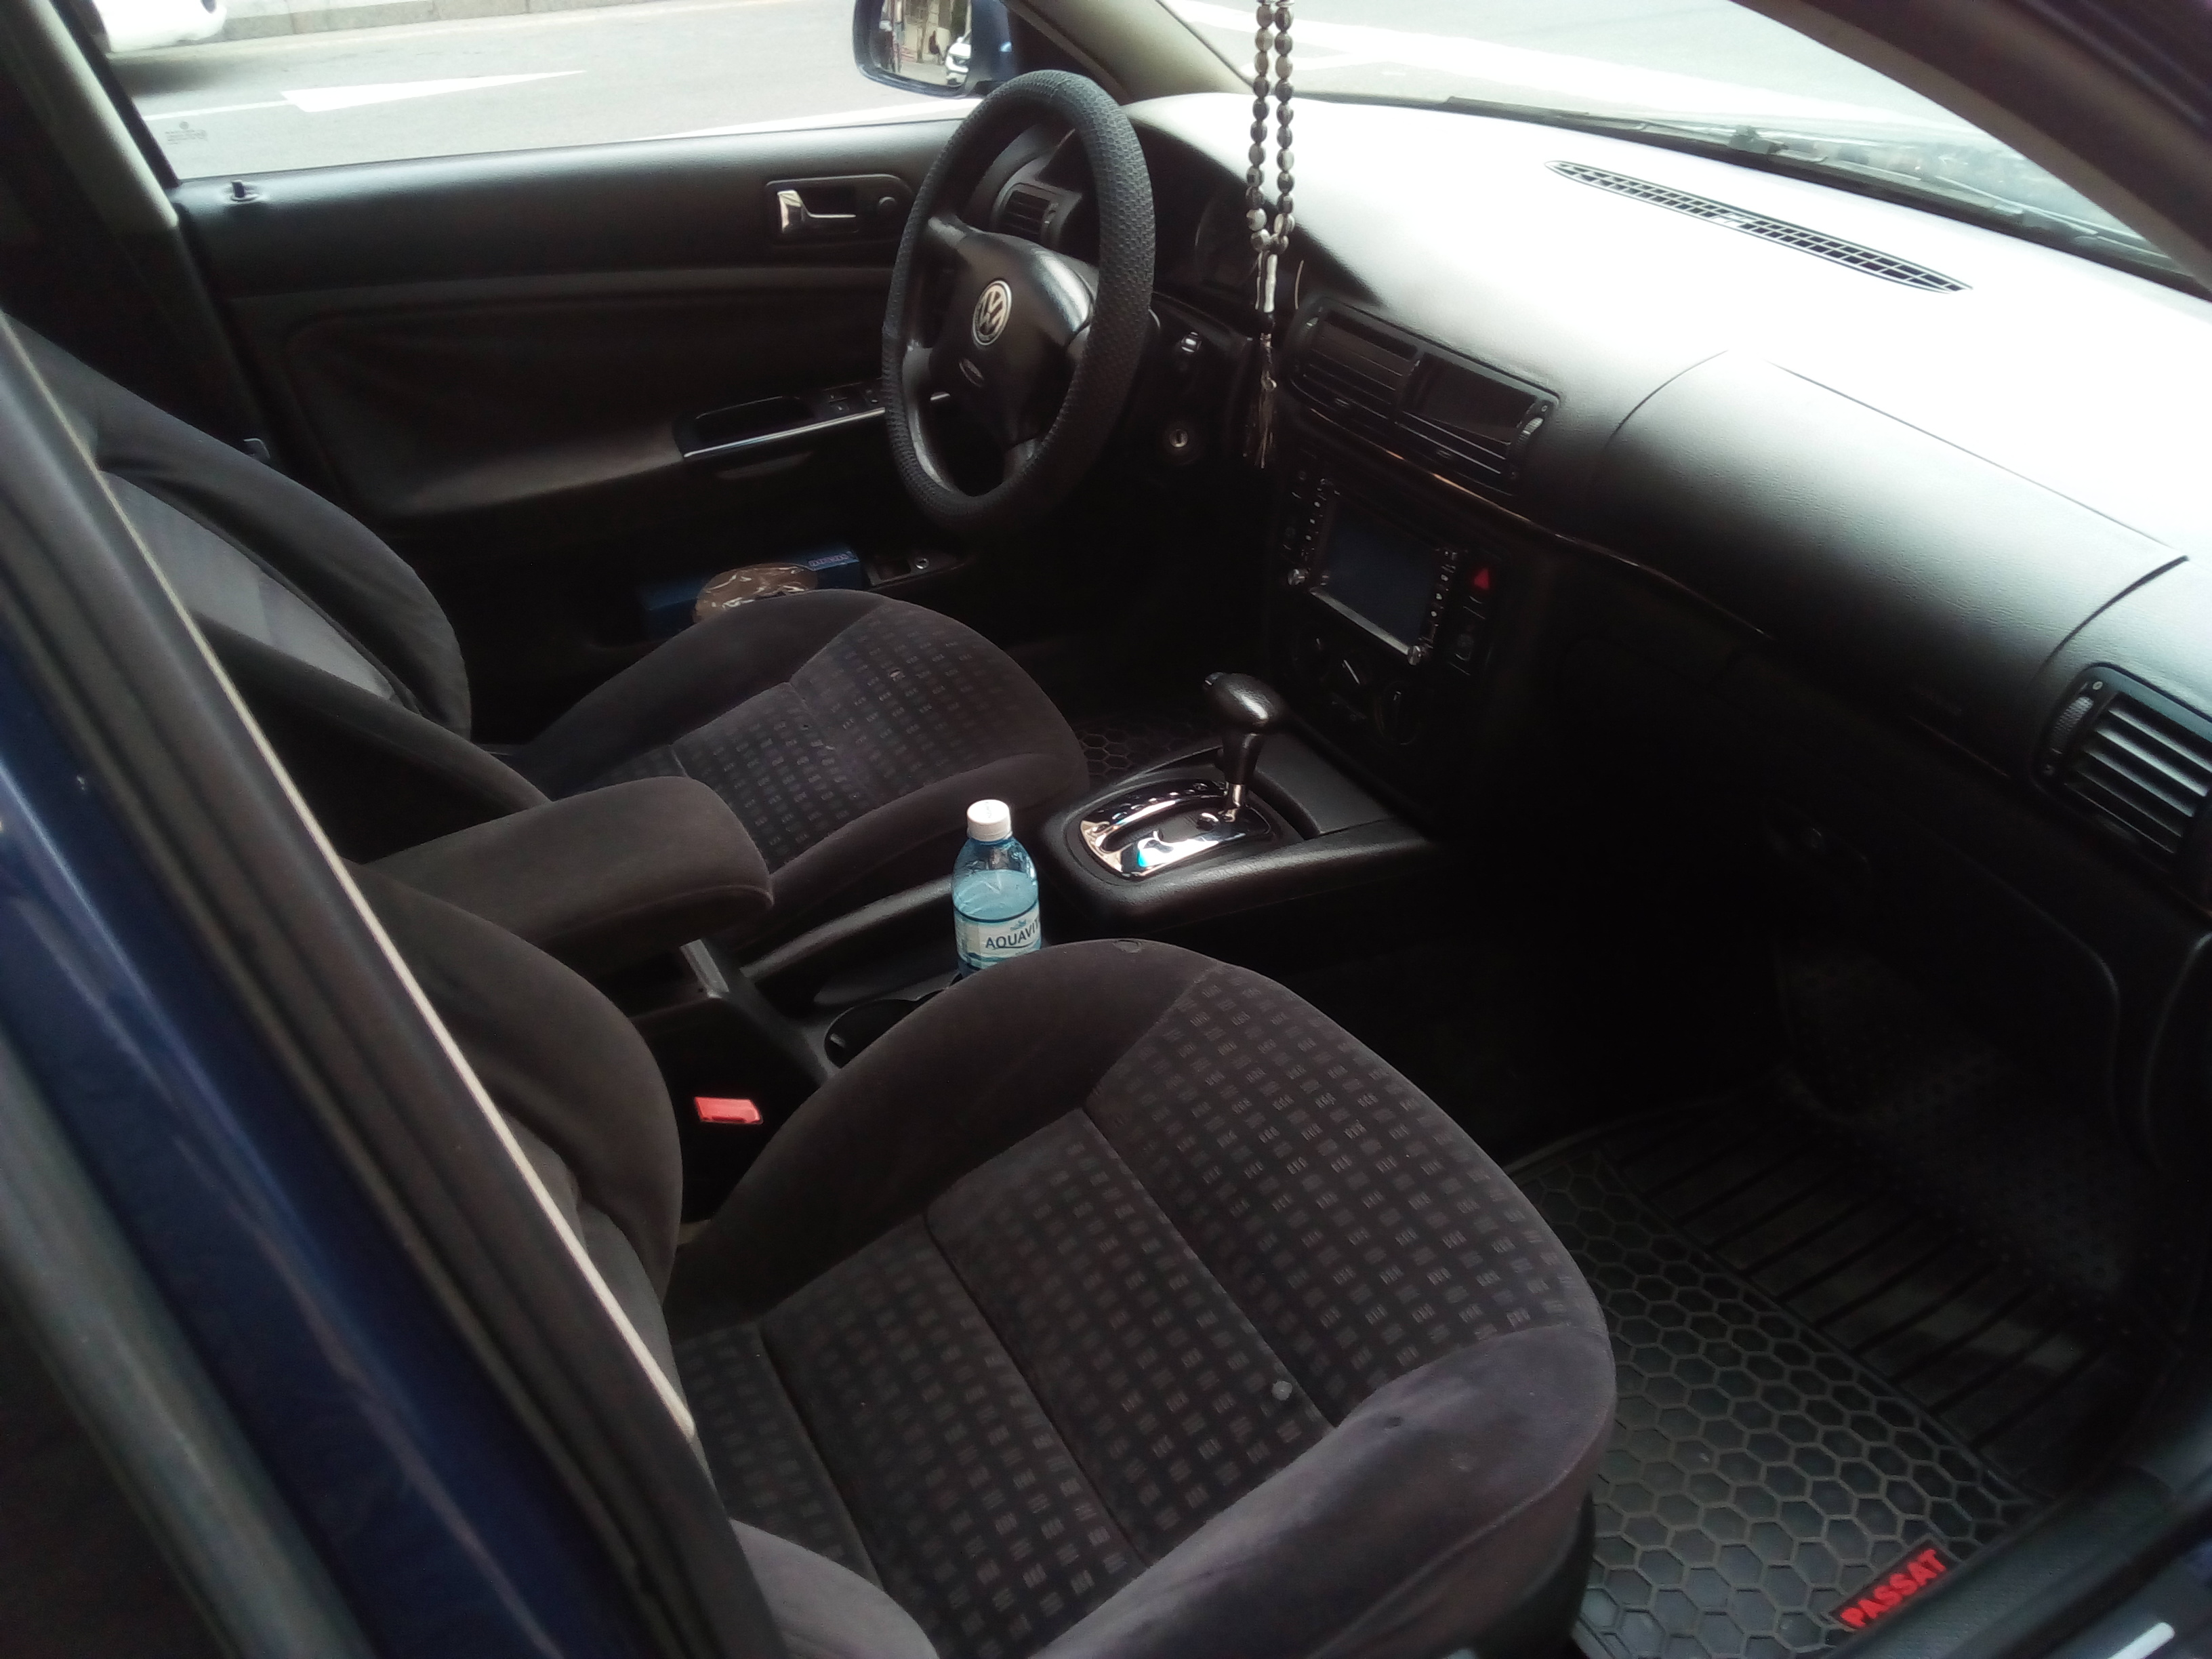 Volkswagen Passat 1.8(lt) 2002 İkinci əl  $3500